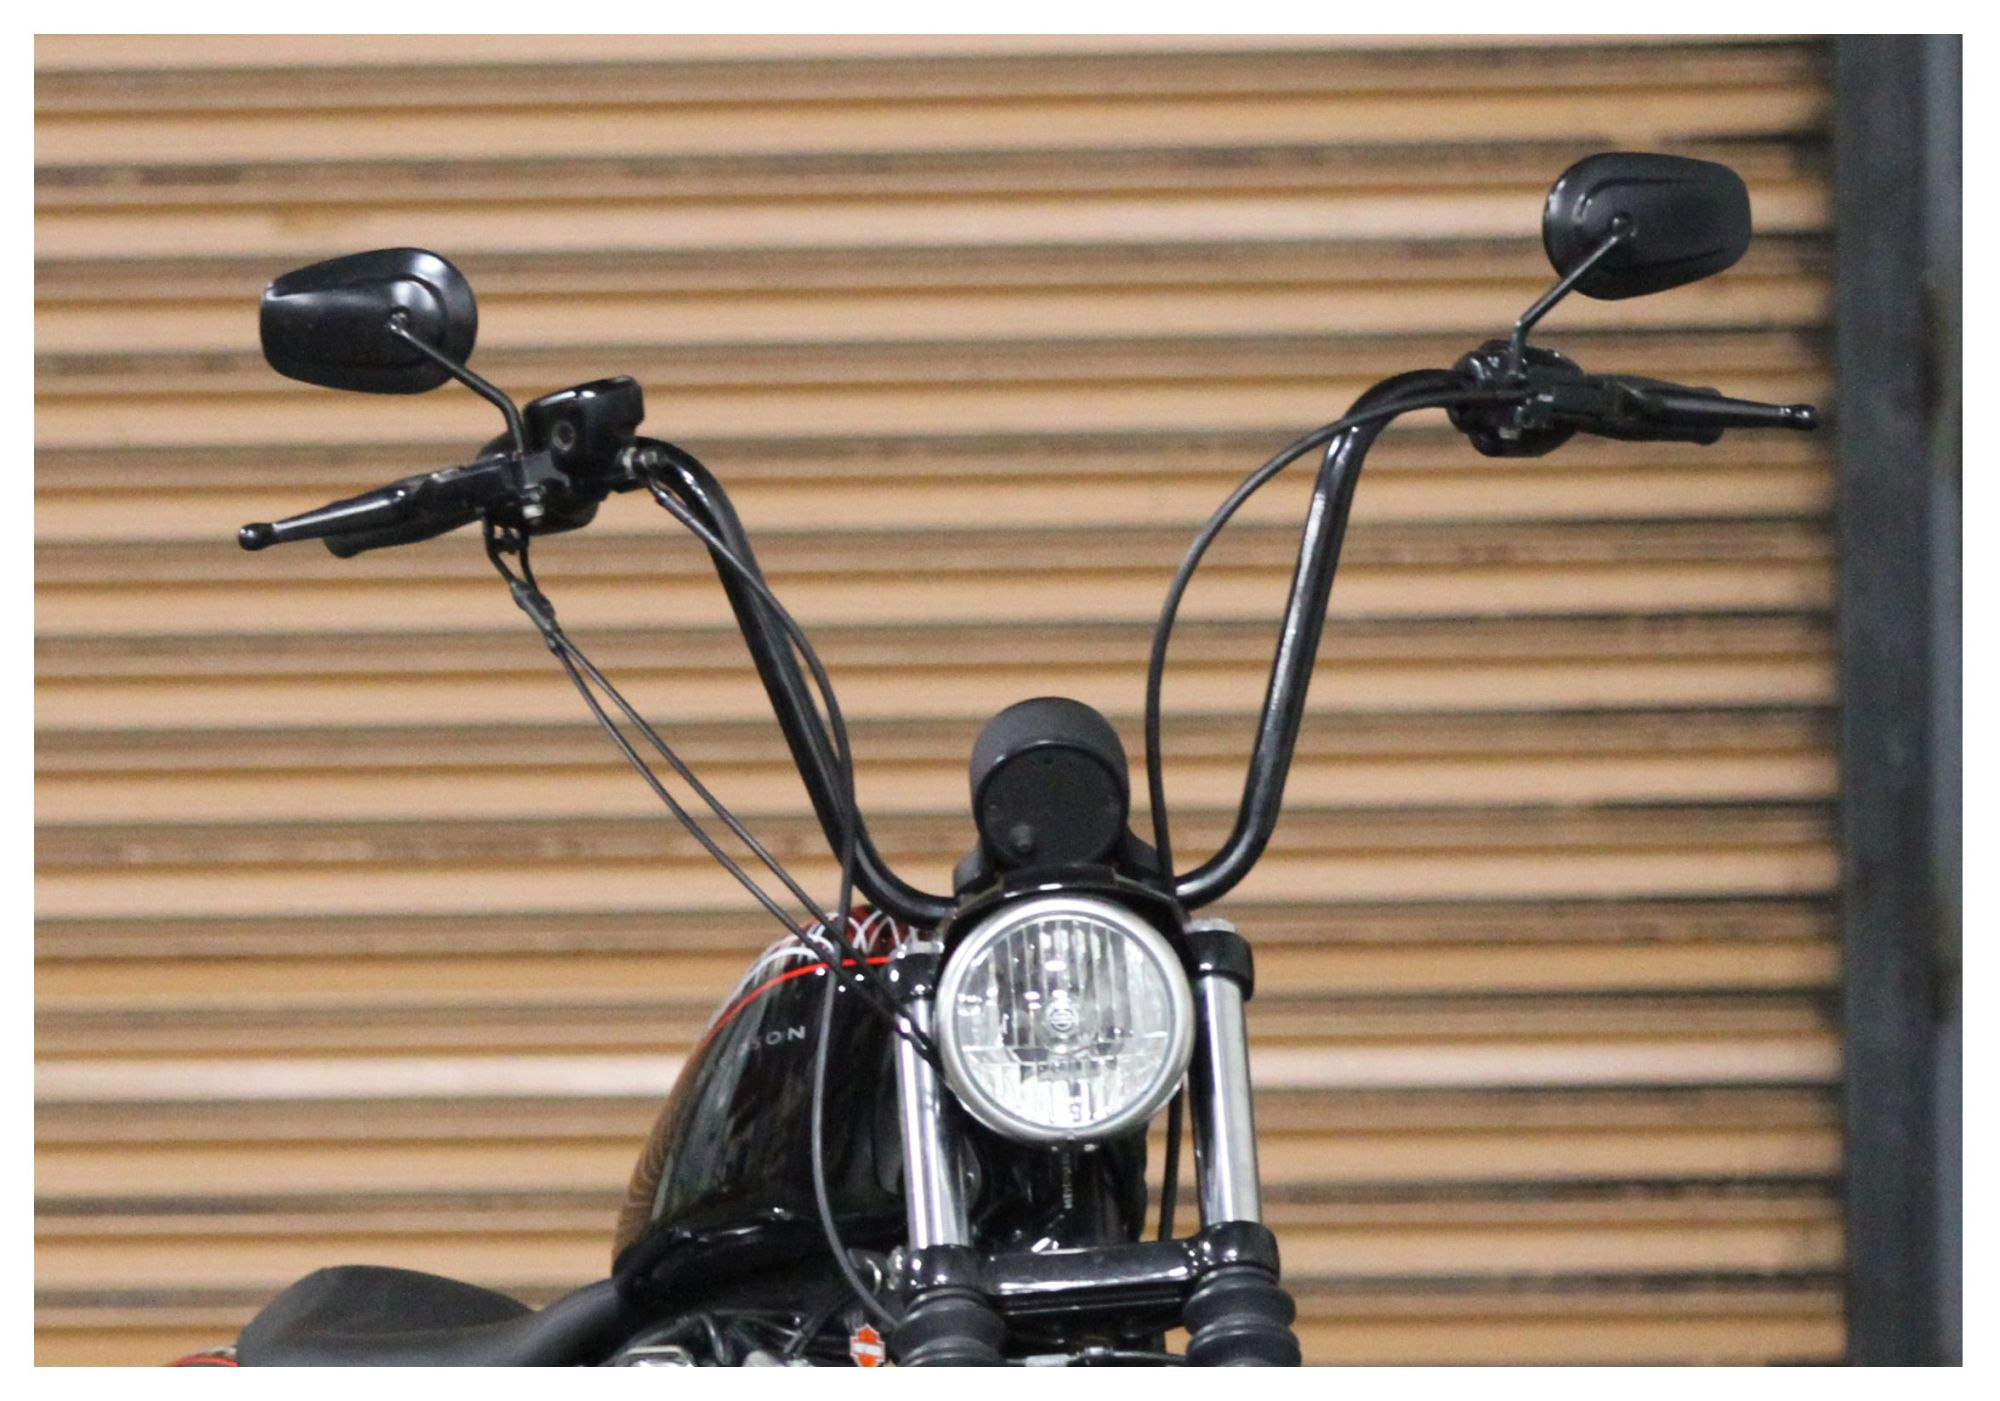 hight resolution of burly handlebar cable installation kit for harley sportster 2007 2013 revzilla